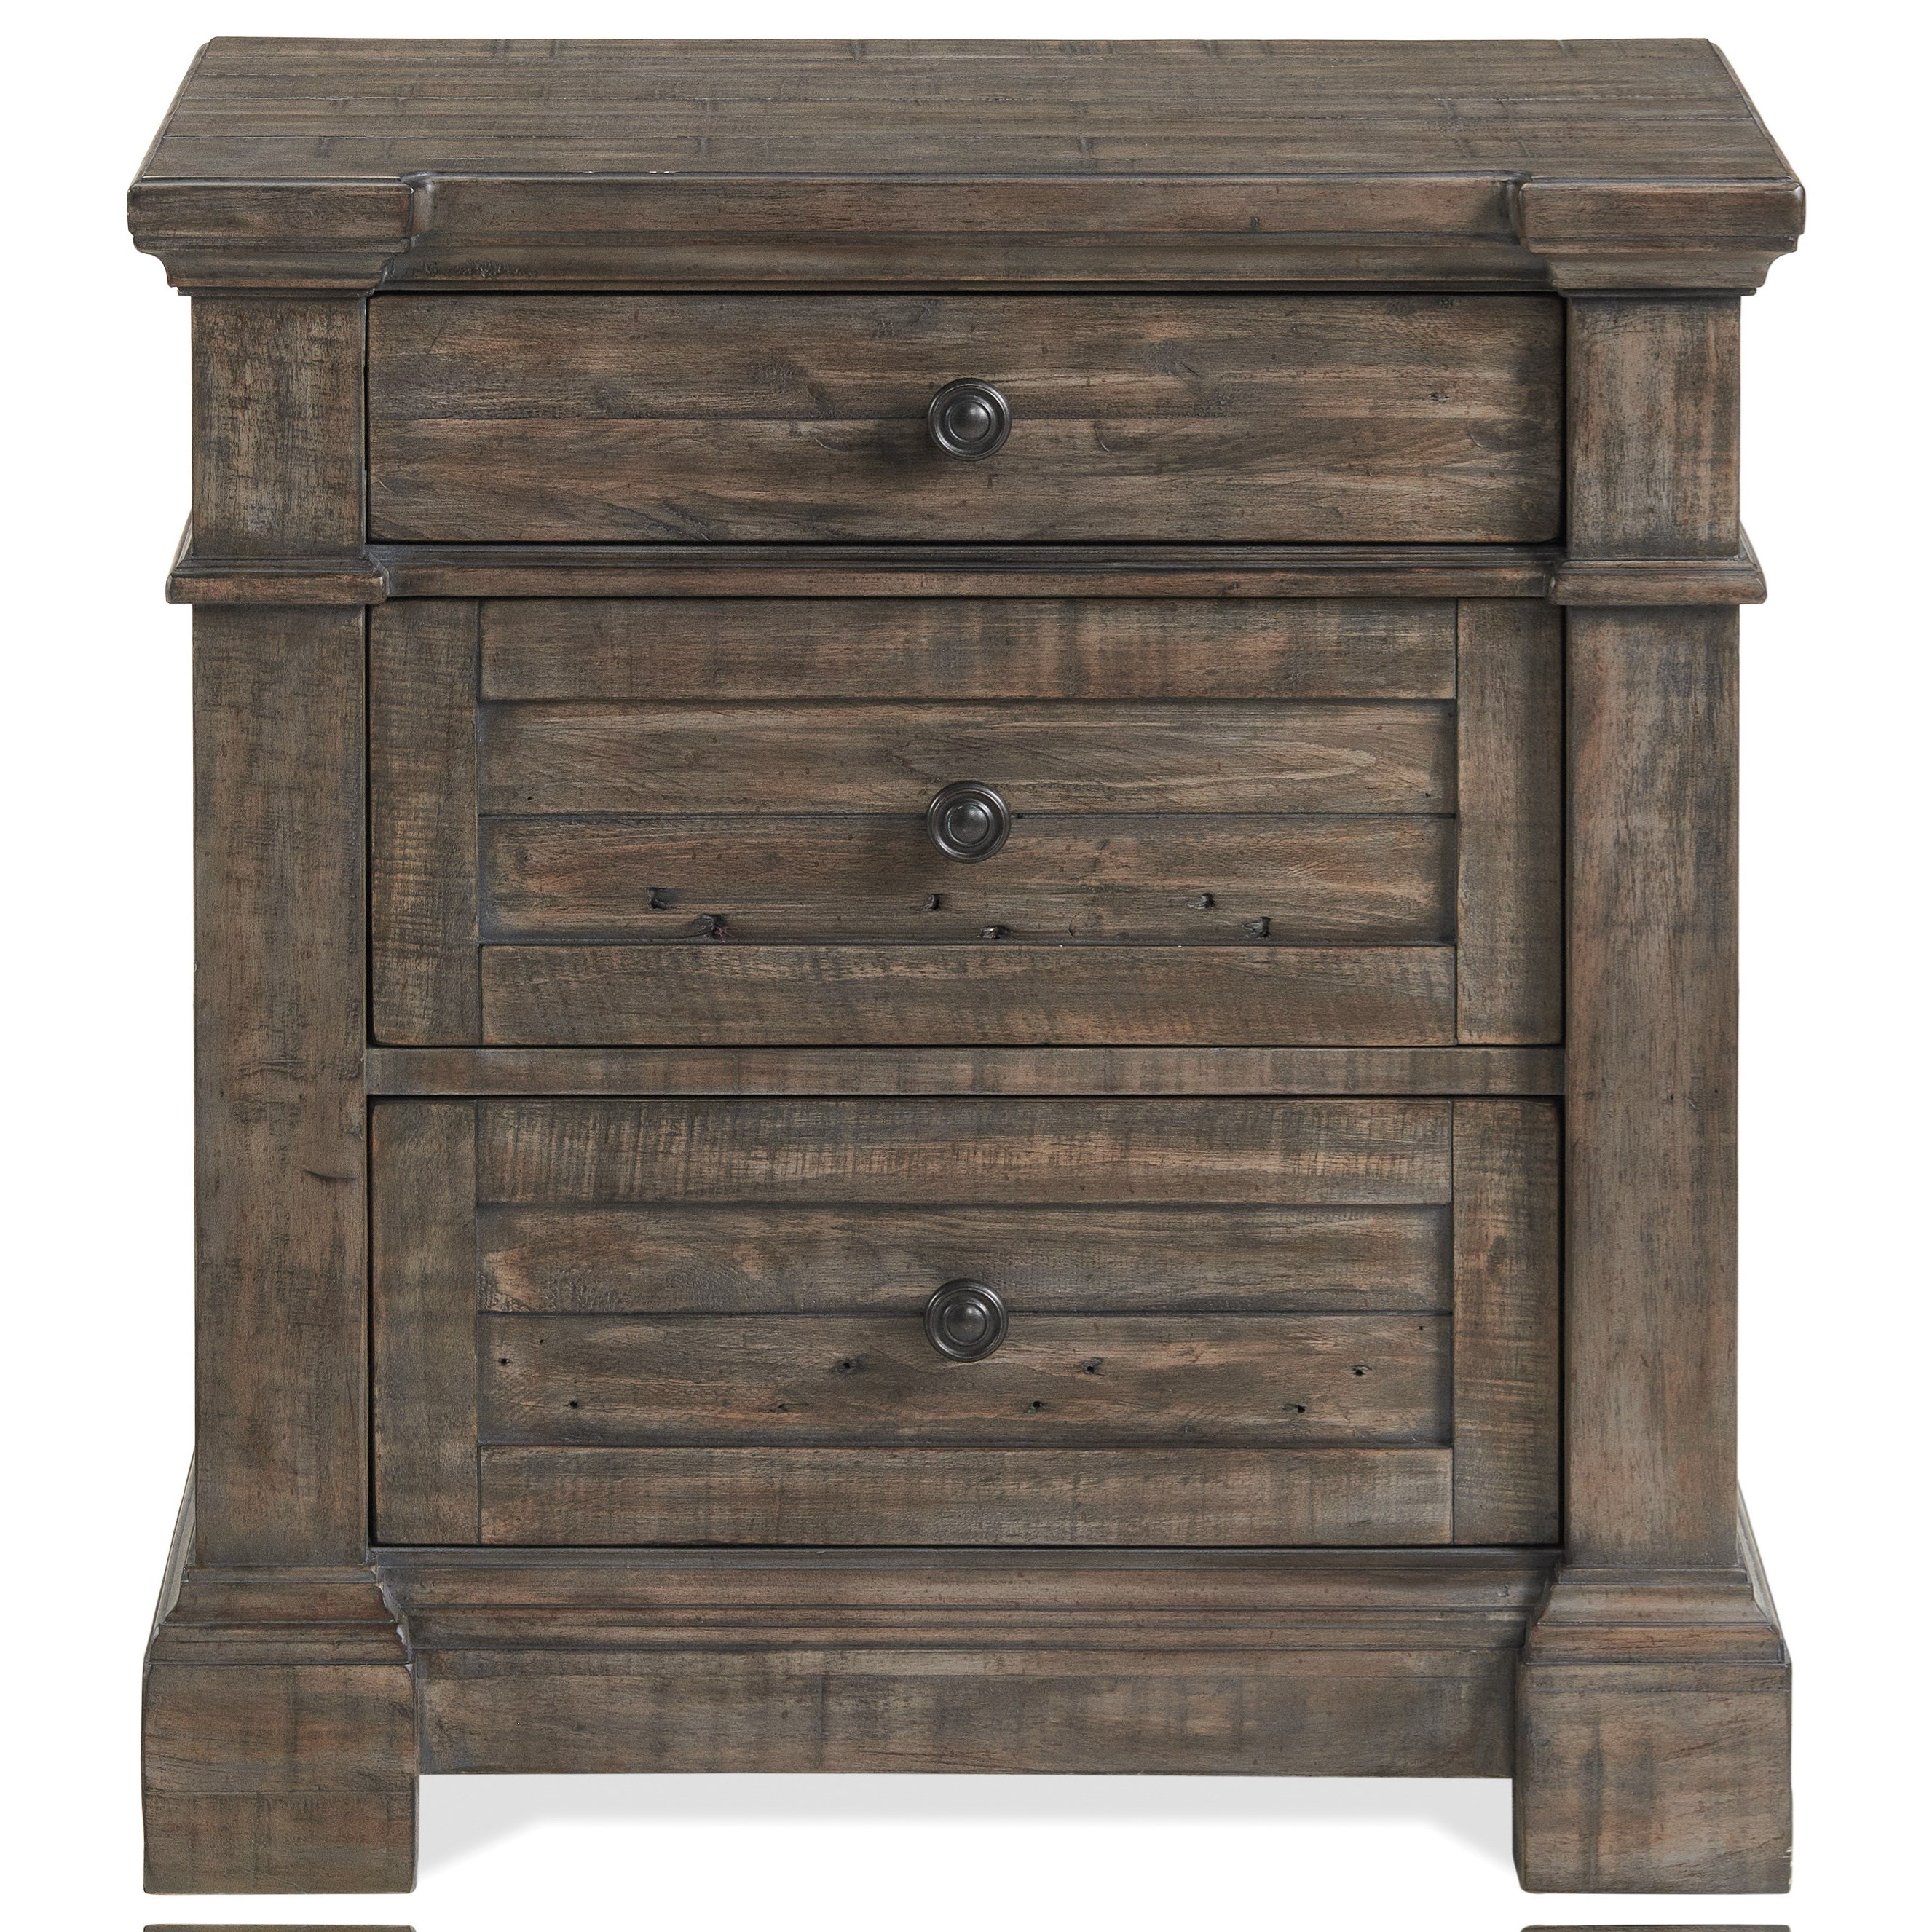 Bradford 3-Drawer Nightstand by Riverside Furniture at Zak's Home